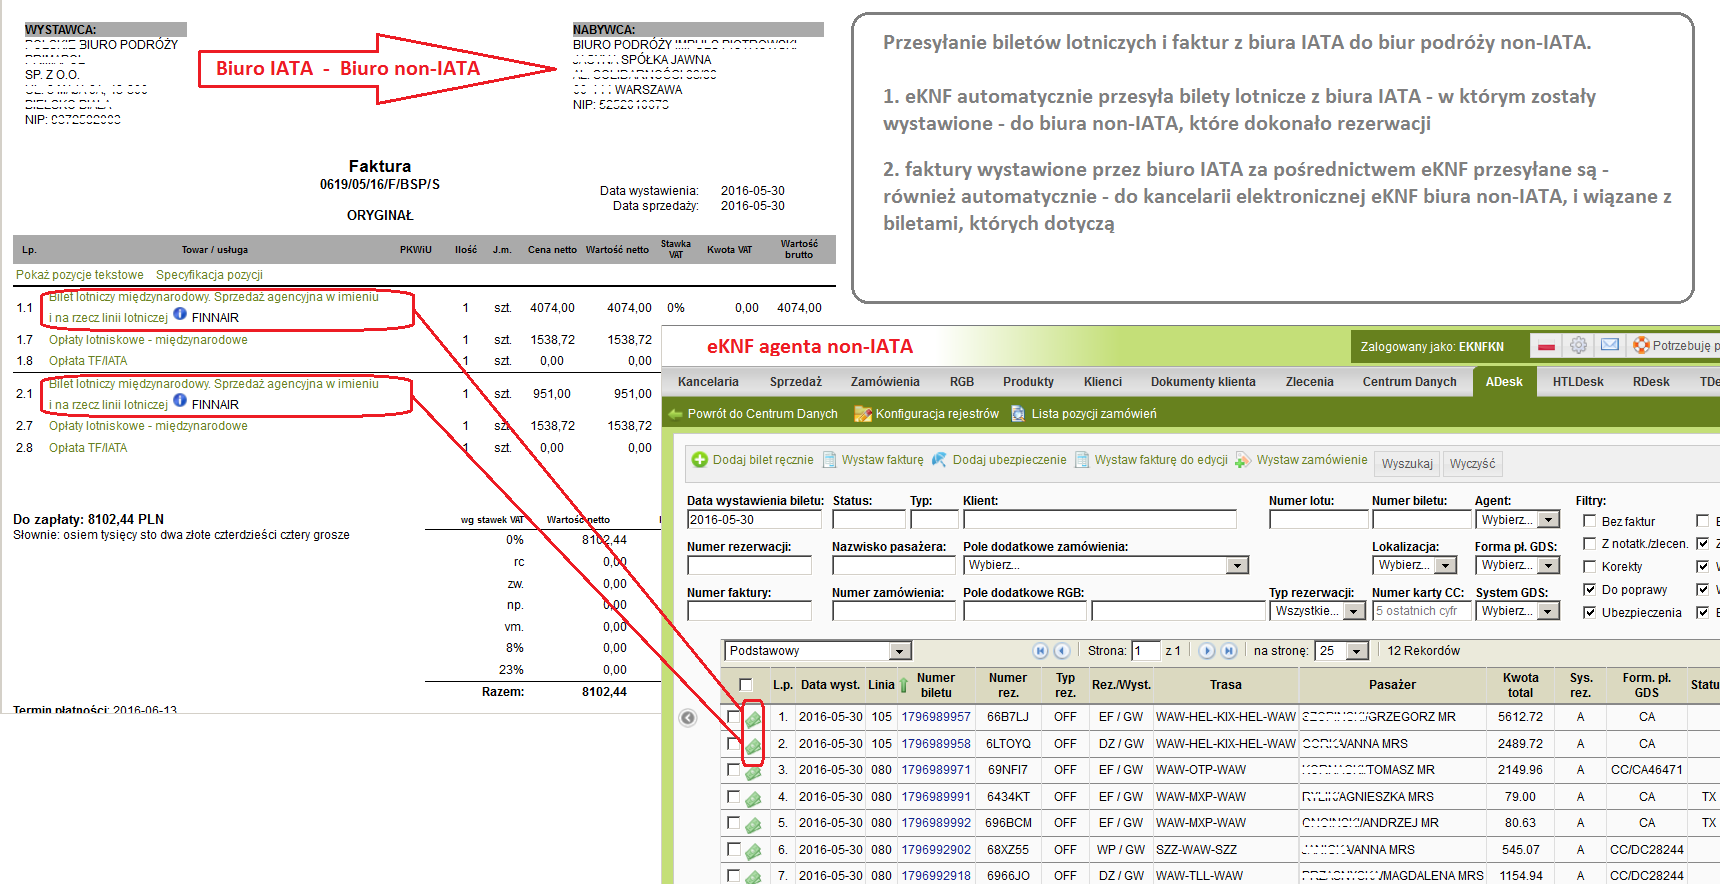 Przesyłanie faktur z biura IATA do non-IATA